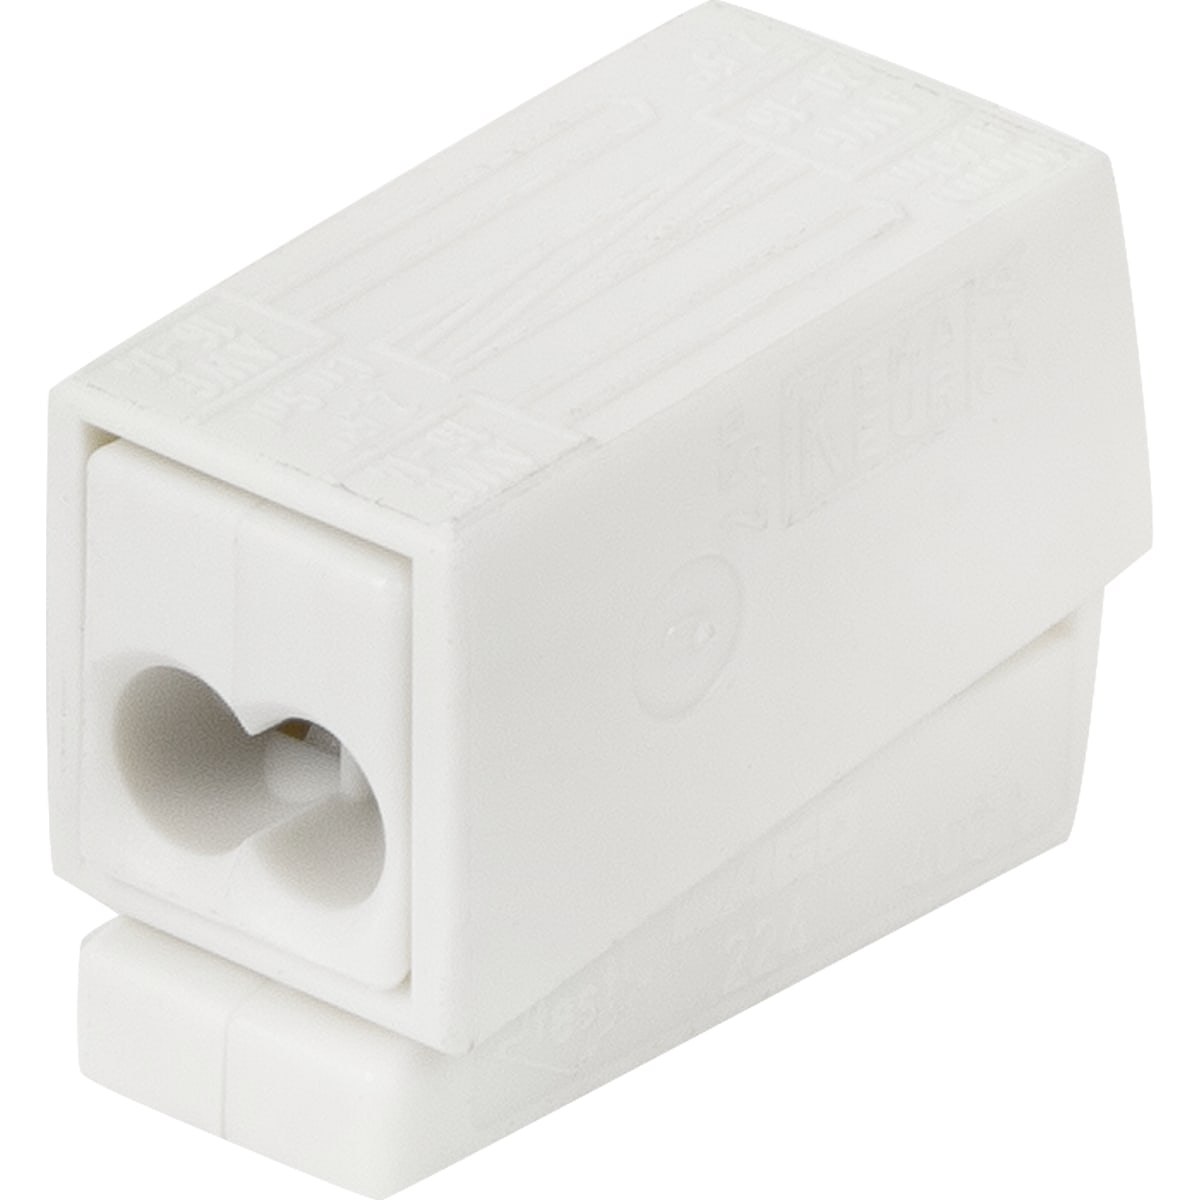 Клемма Wago 9.5х15.5х20.5 мм, поликарбонат, 5 шт.